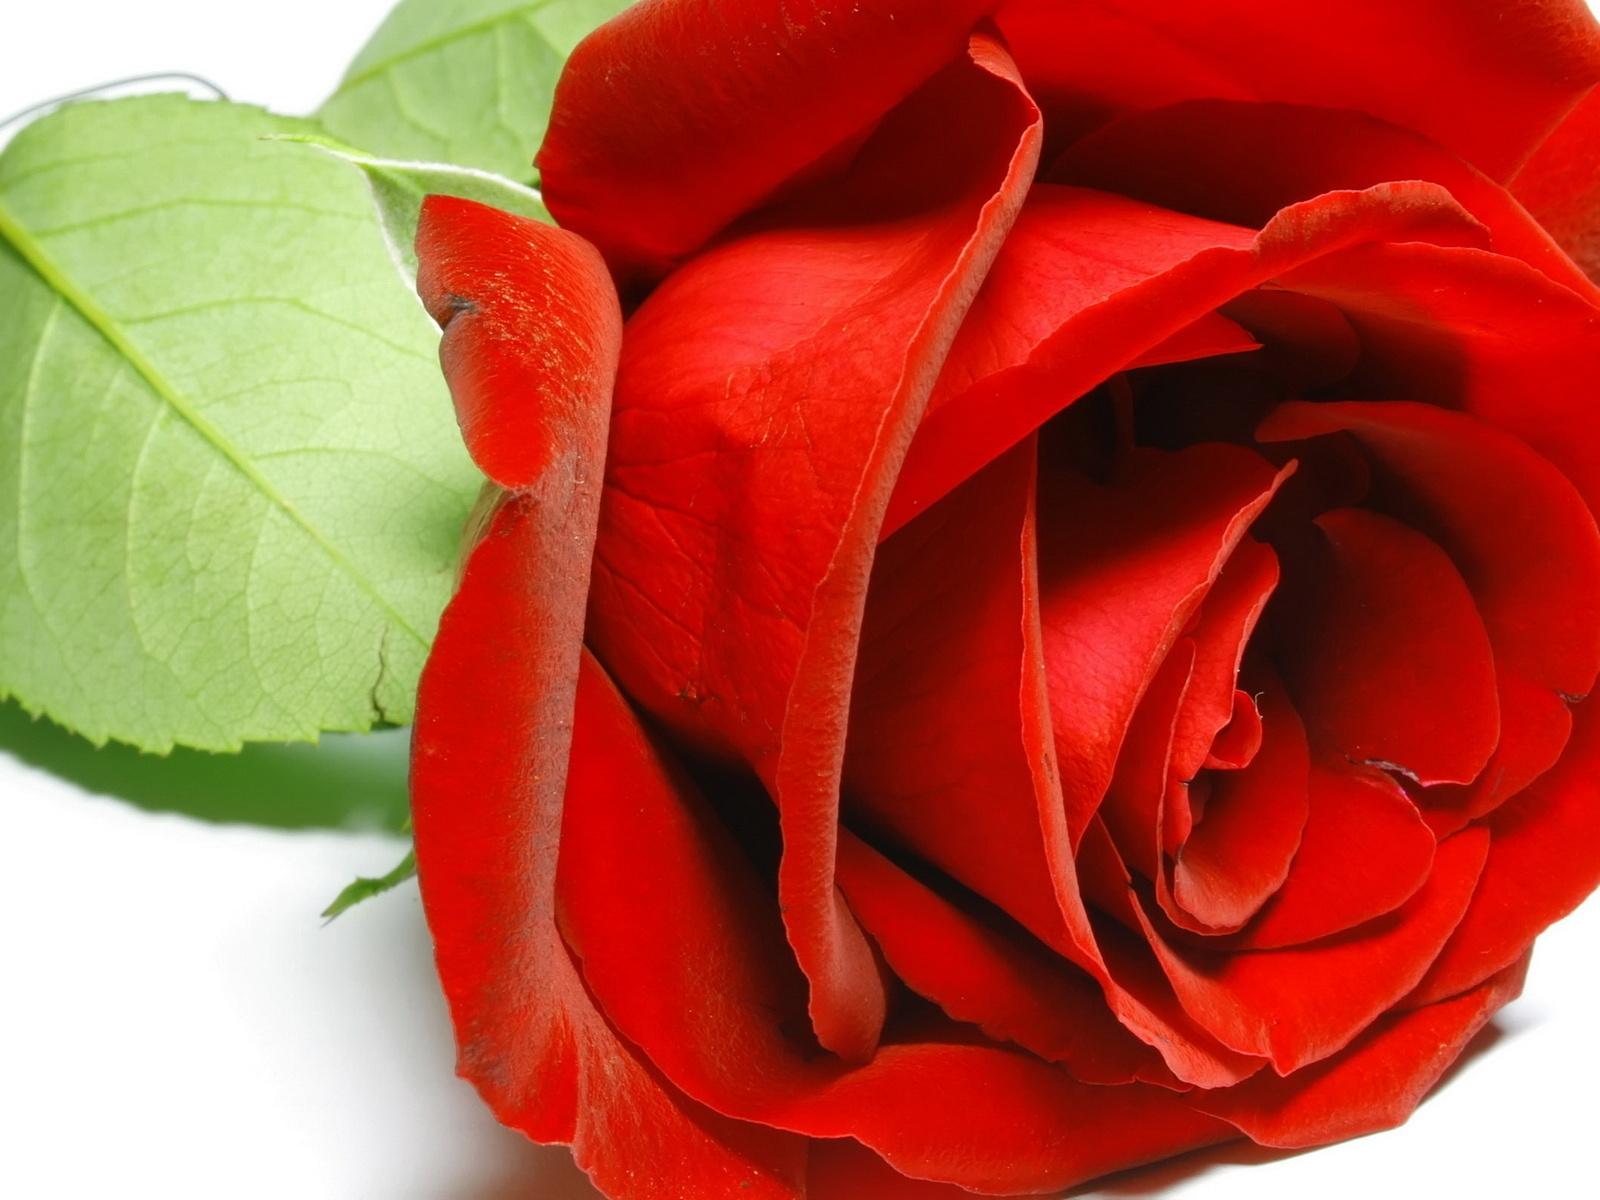 Wallpapers Rosas Rojas: Flores Rosas Rojas Wallpapers Flores Rosa Roja Rojas